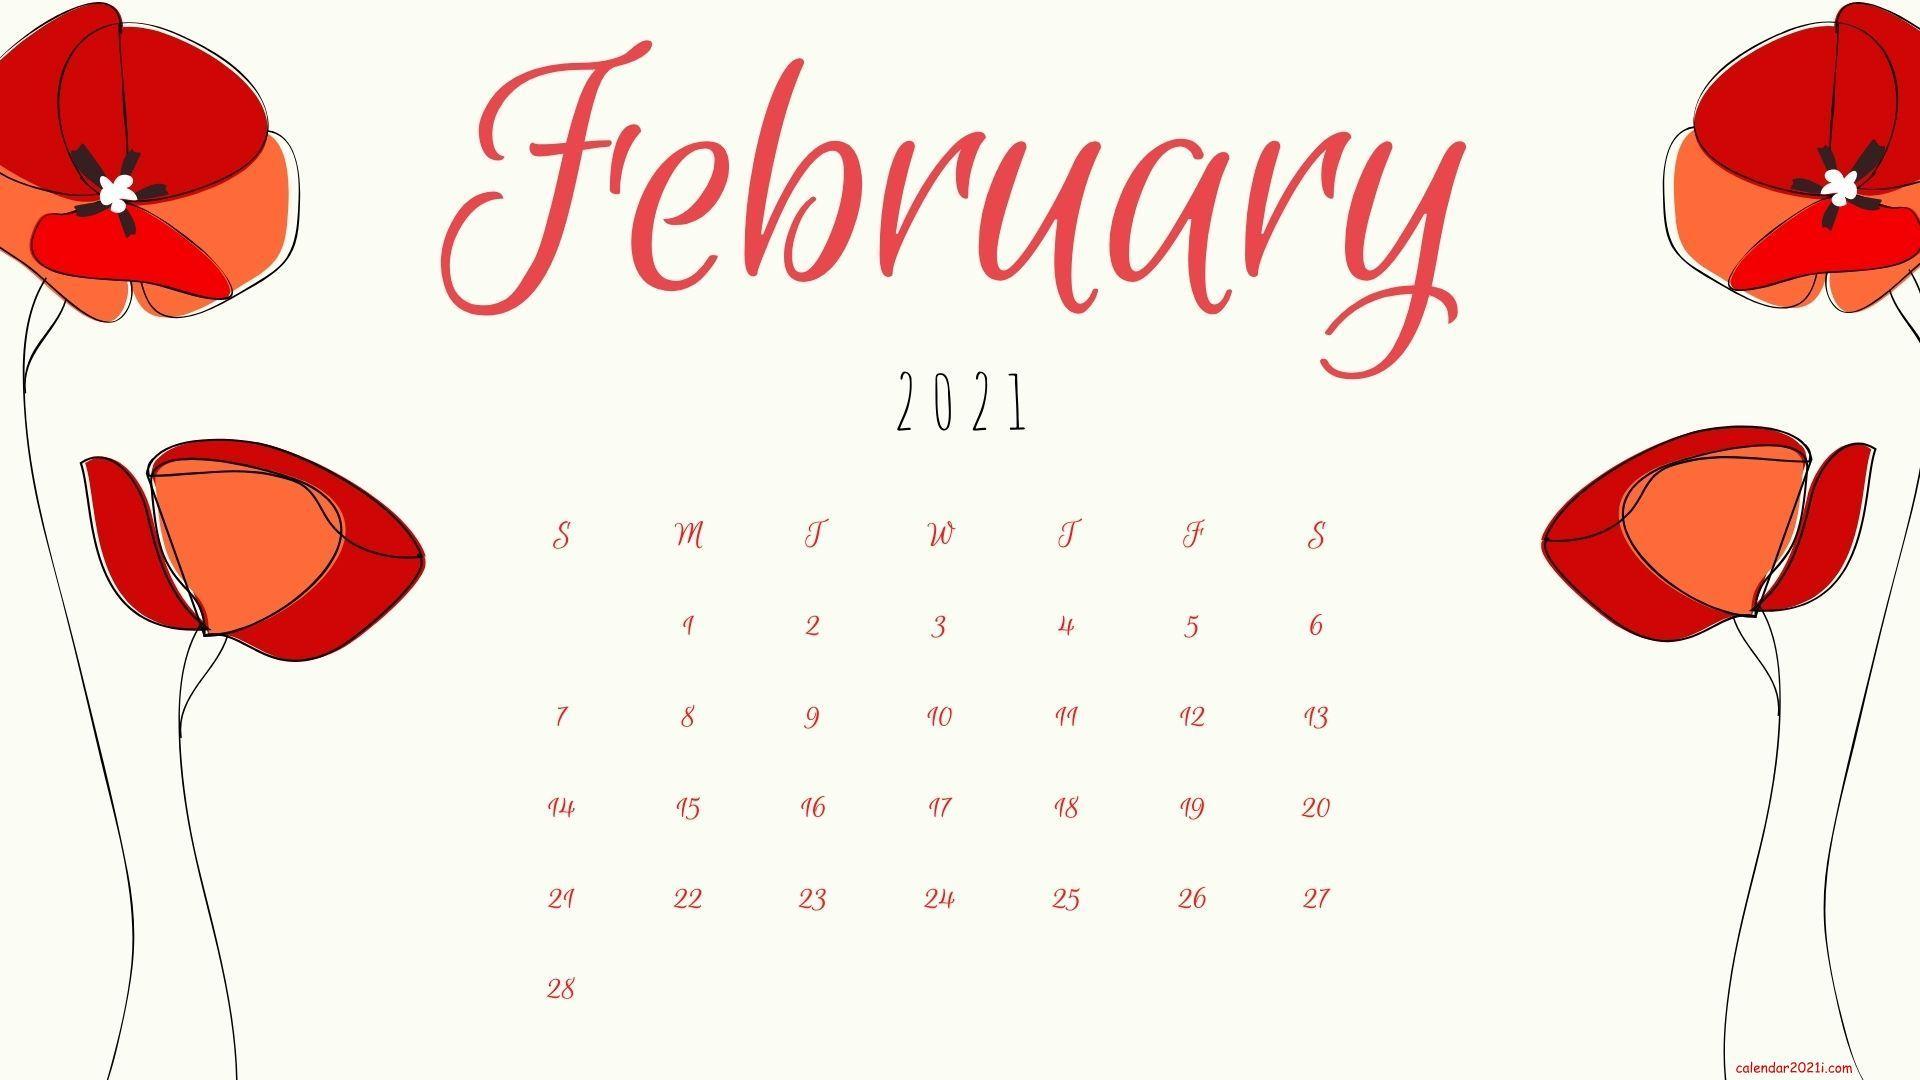 Pin on 2021 Calendars 1920x1080